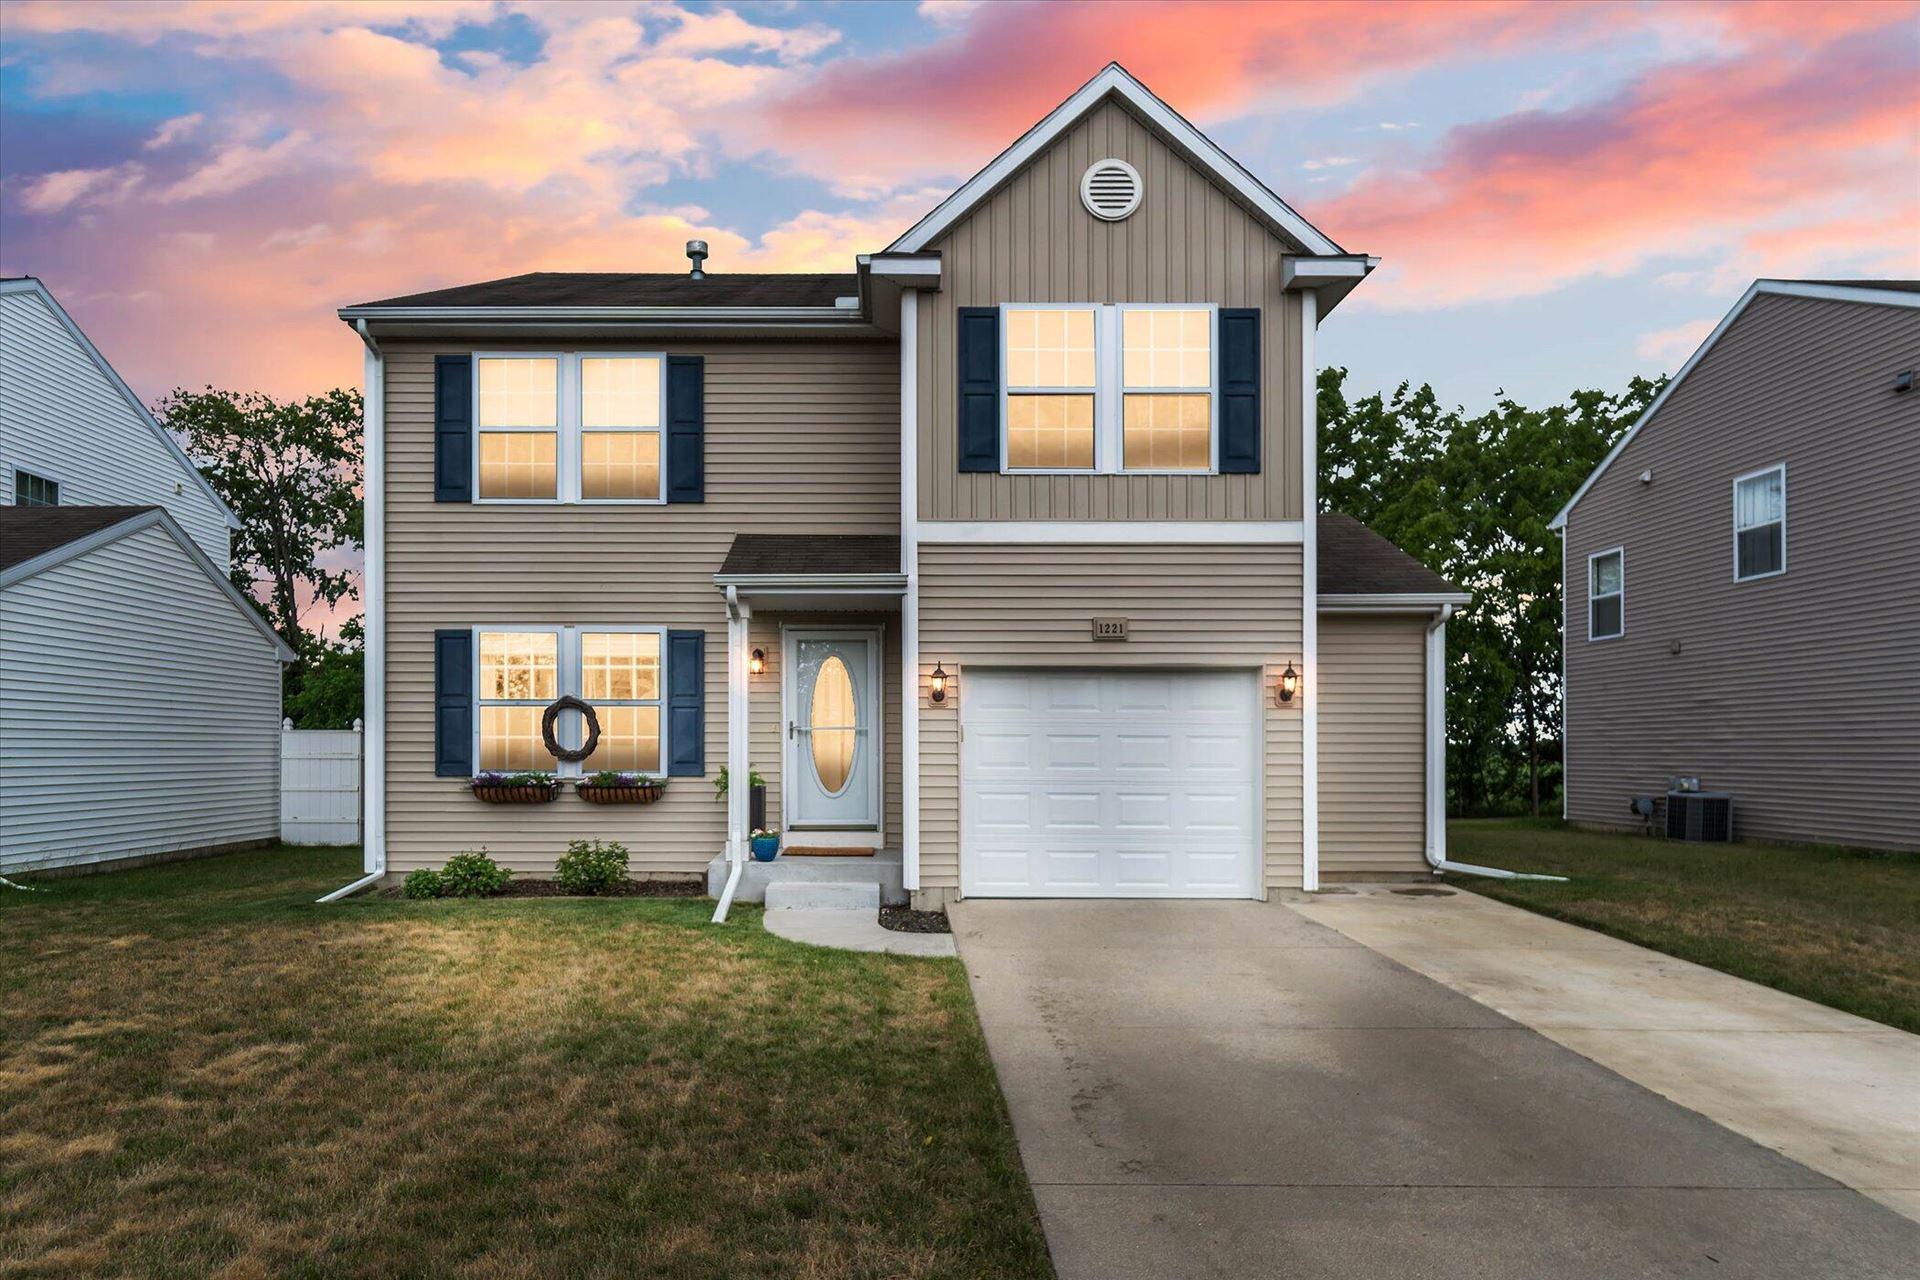 1221 Odell Farm Lane, Vicksburg, MI 49097 - MLS#: 21023875